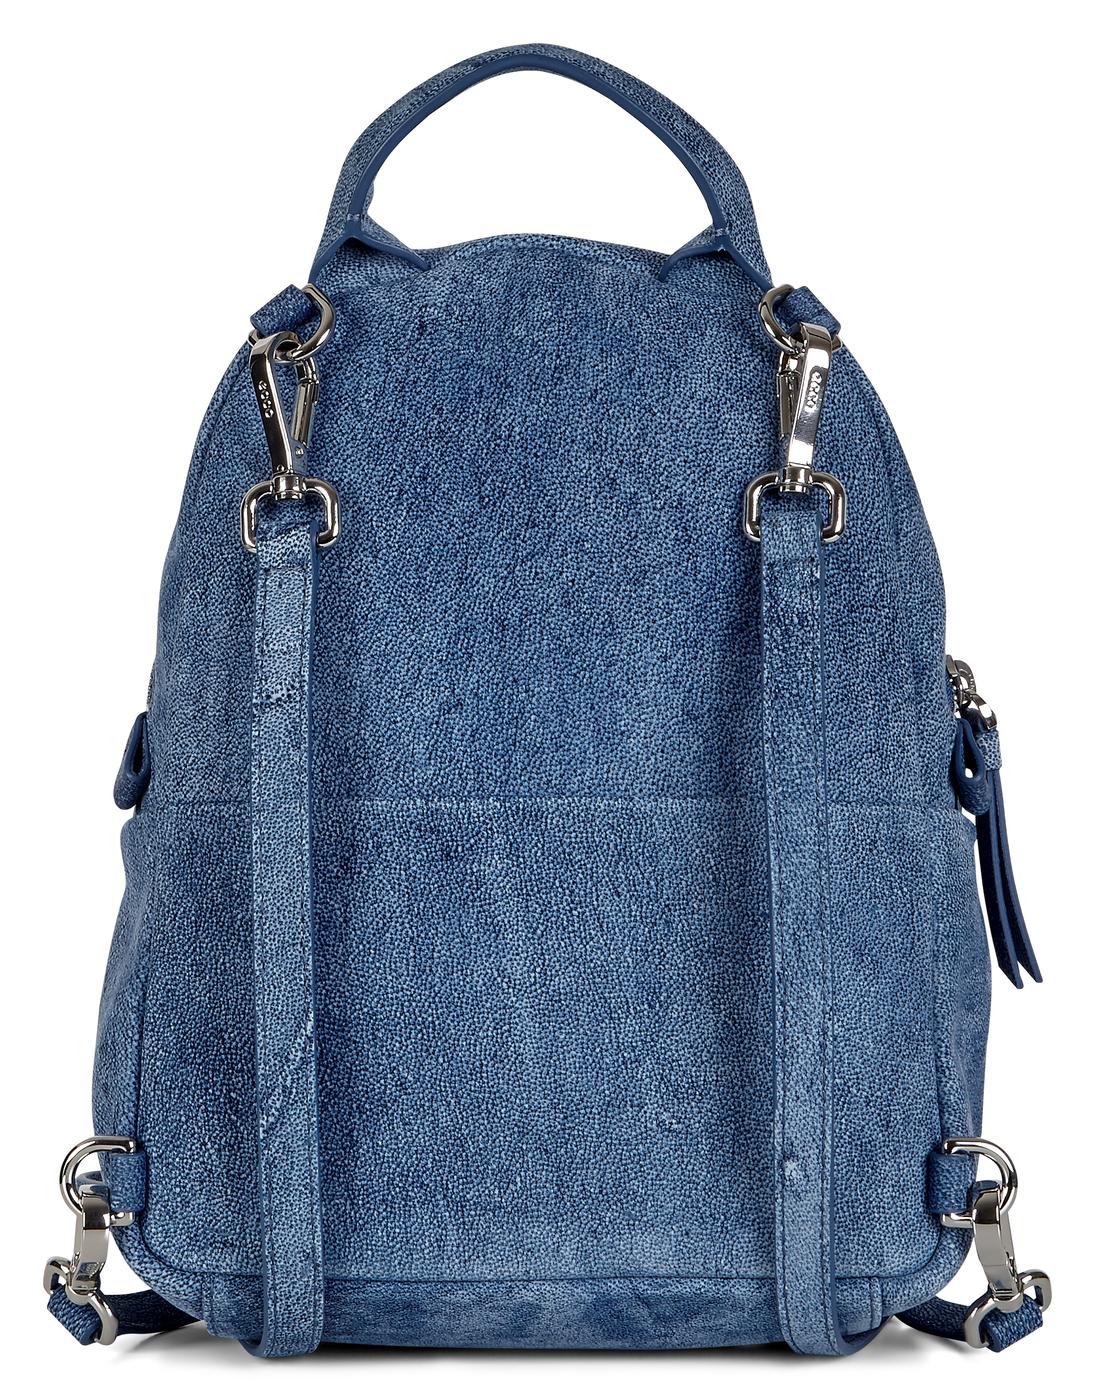 ECCO SP3 Indigo Mini Backpack